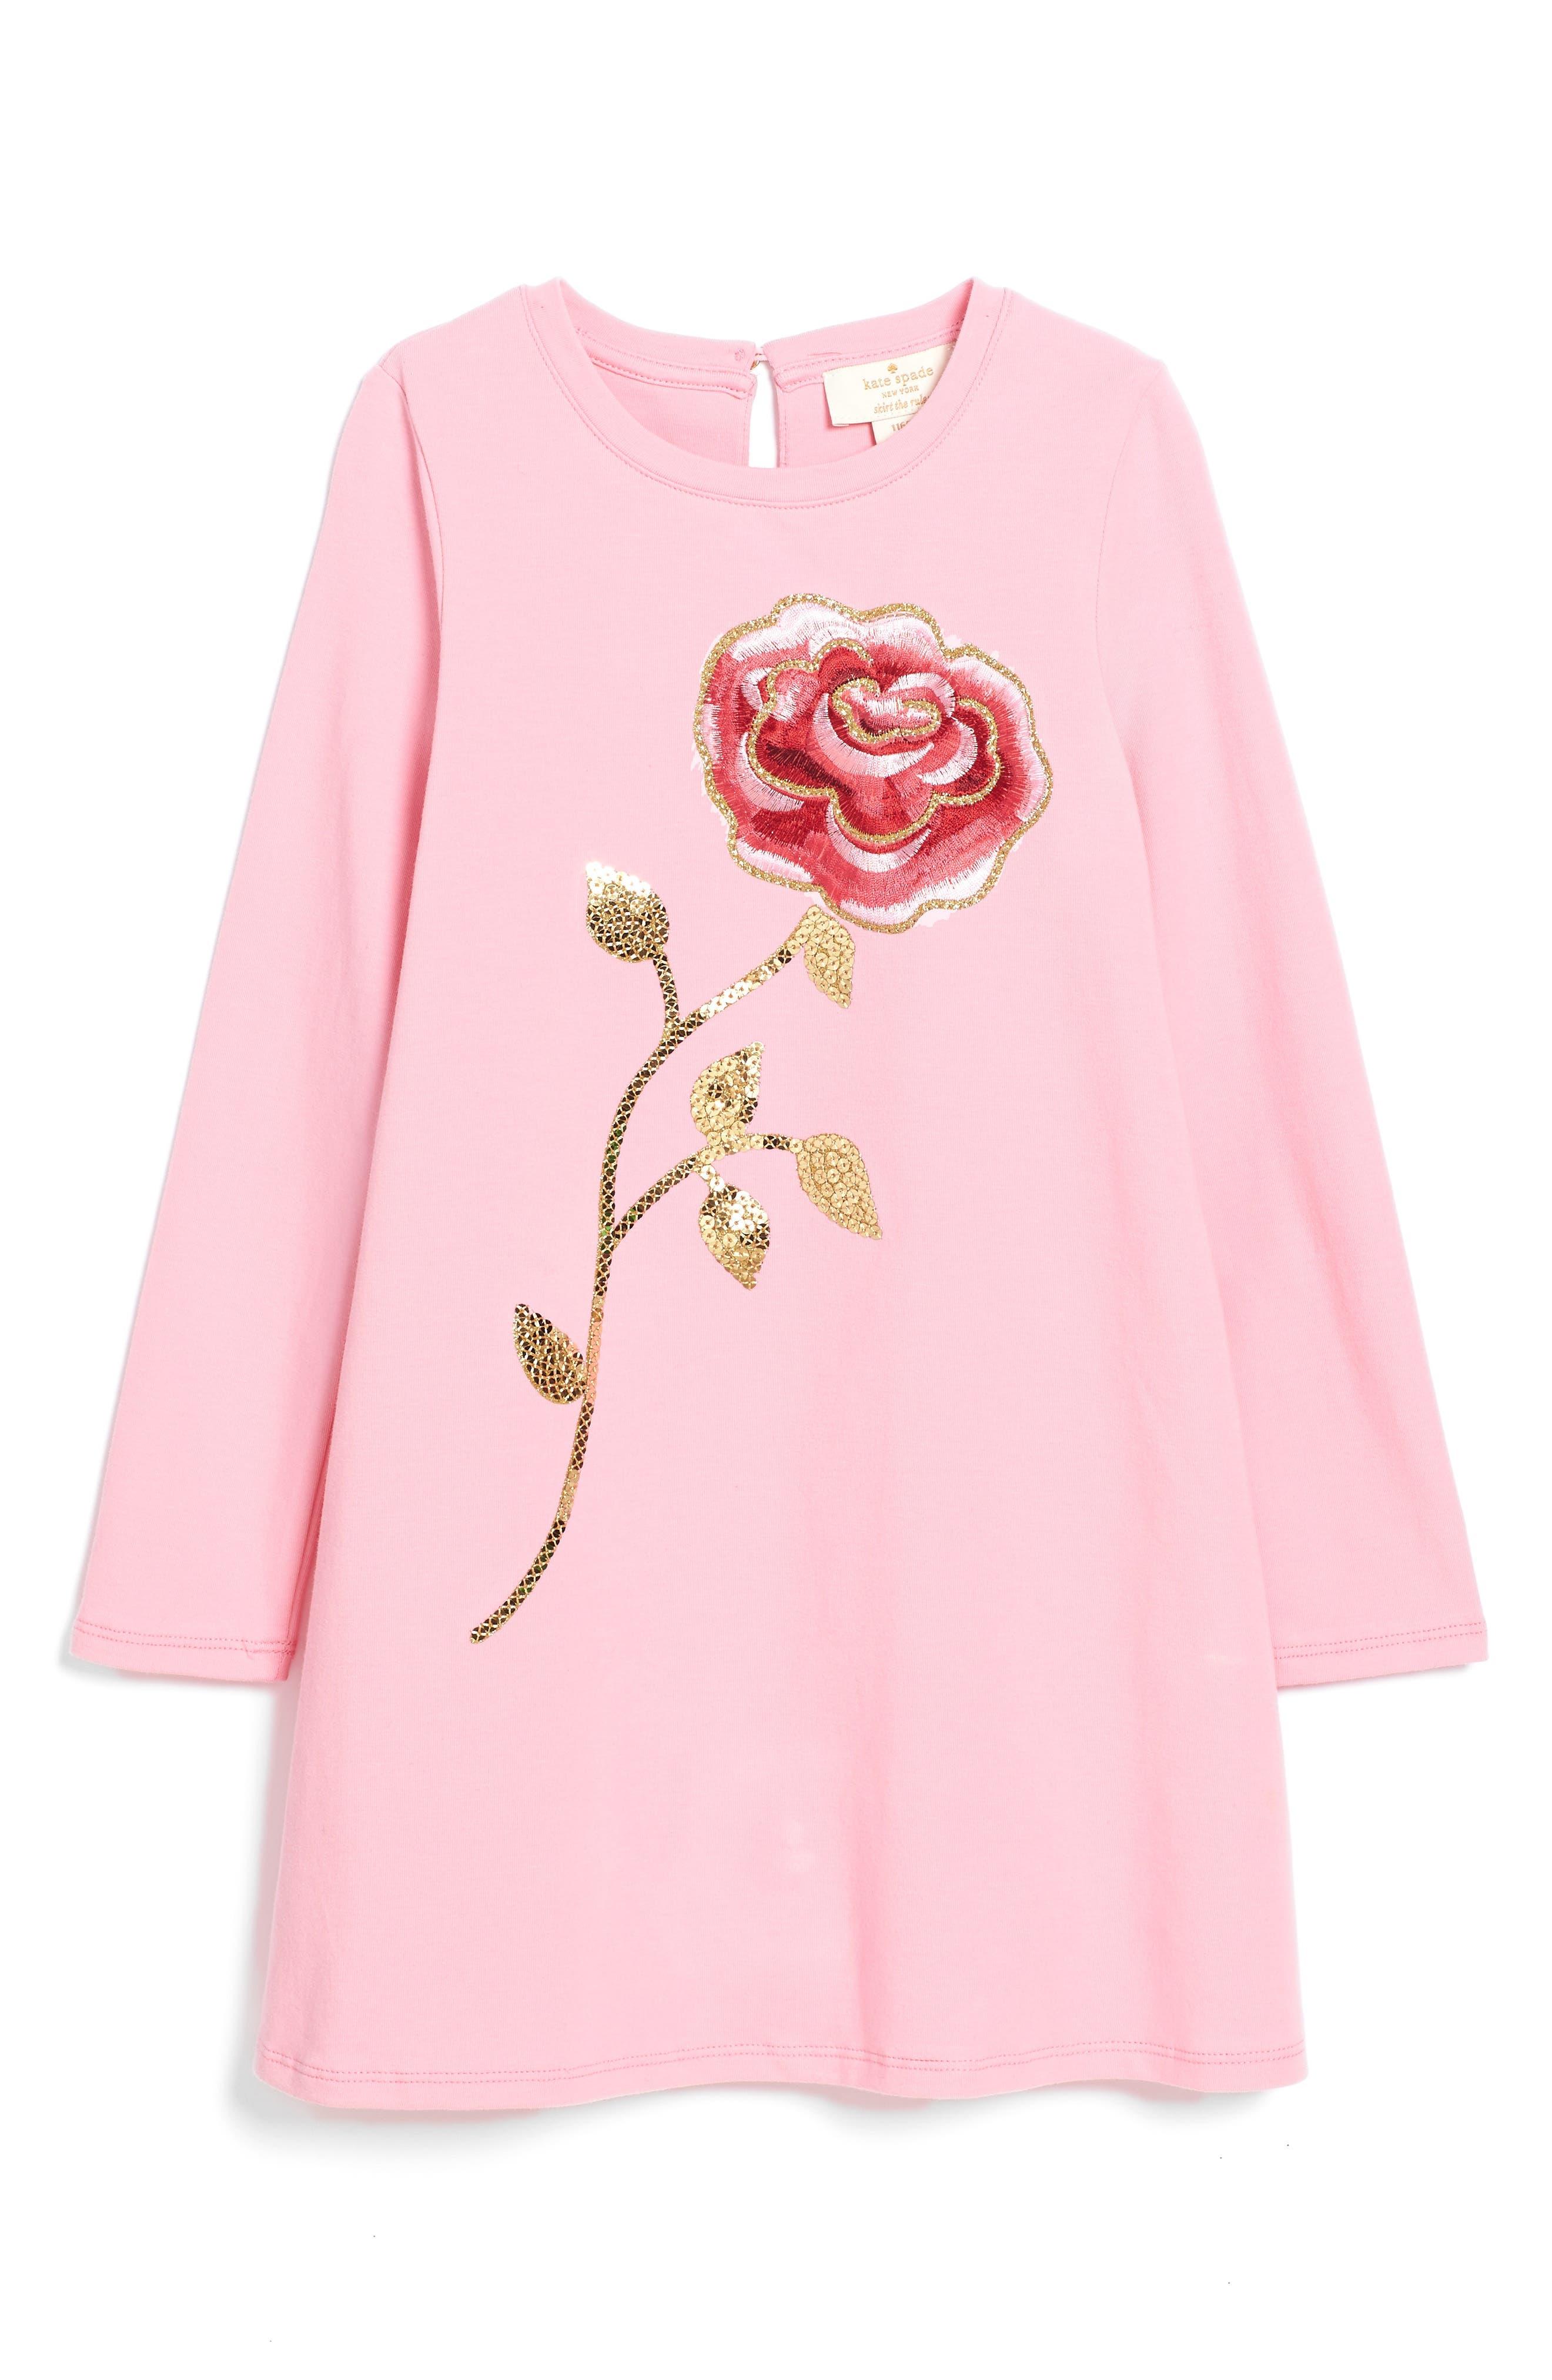 Alternate Image 1 Selected - kate spade new york rose dress (Big Girls)